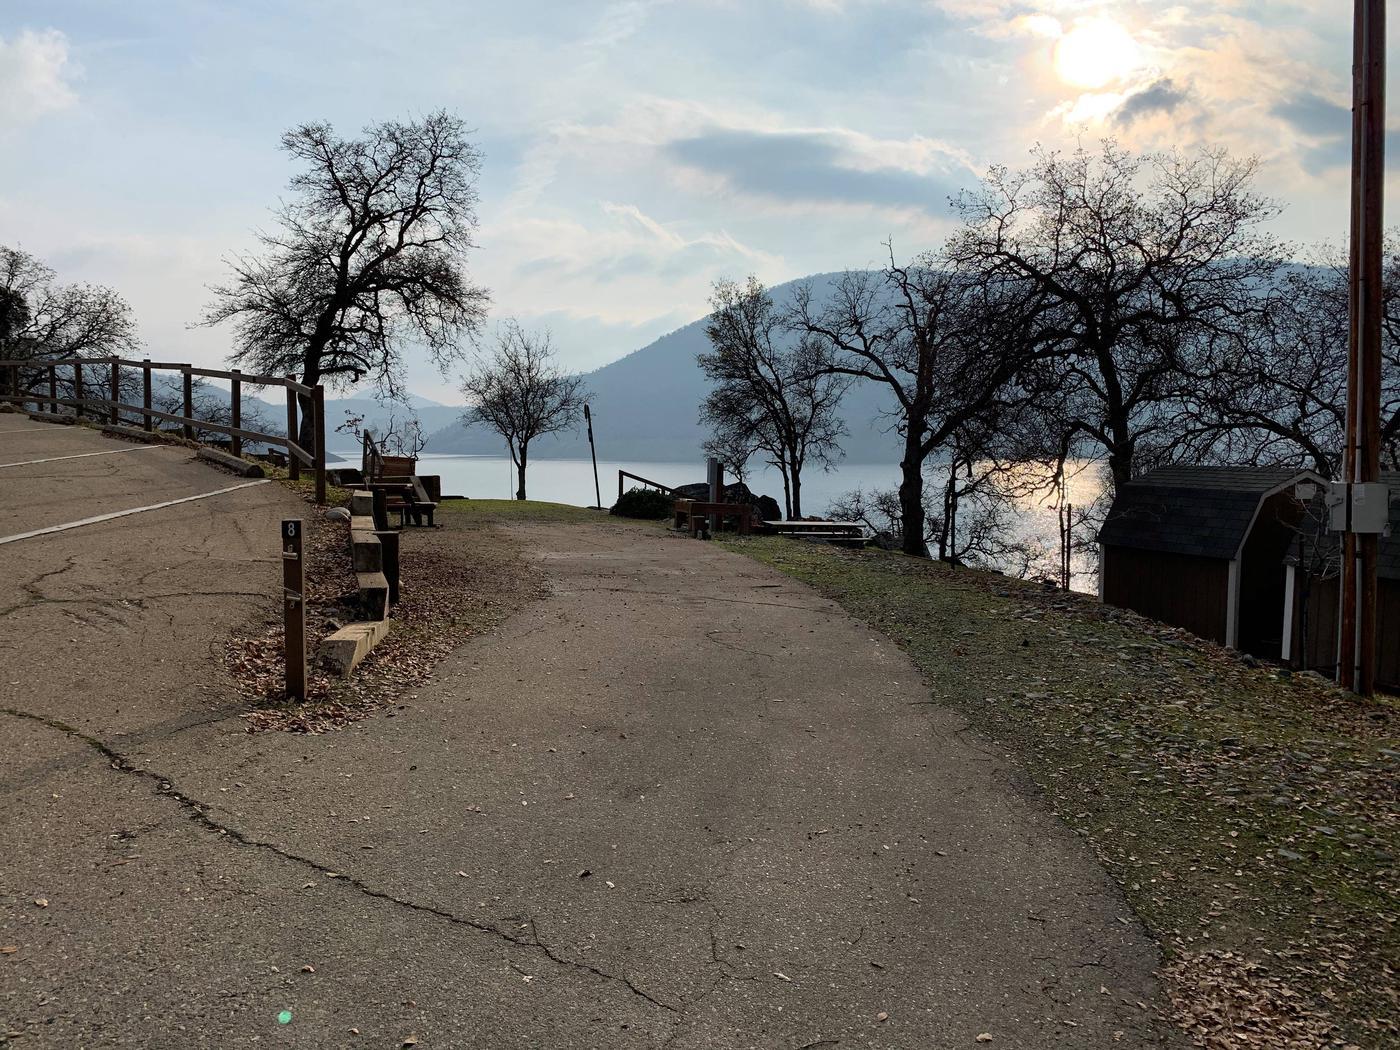 Campsite #8 - Parking